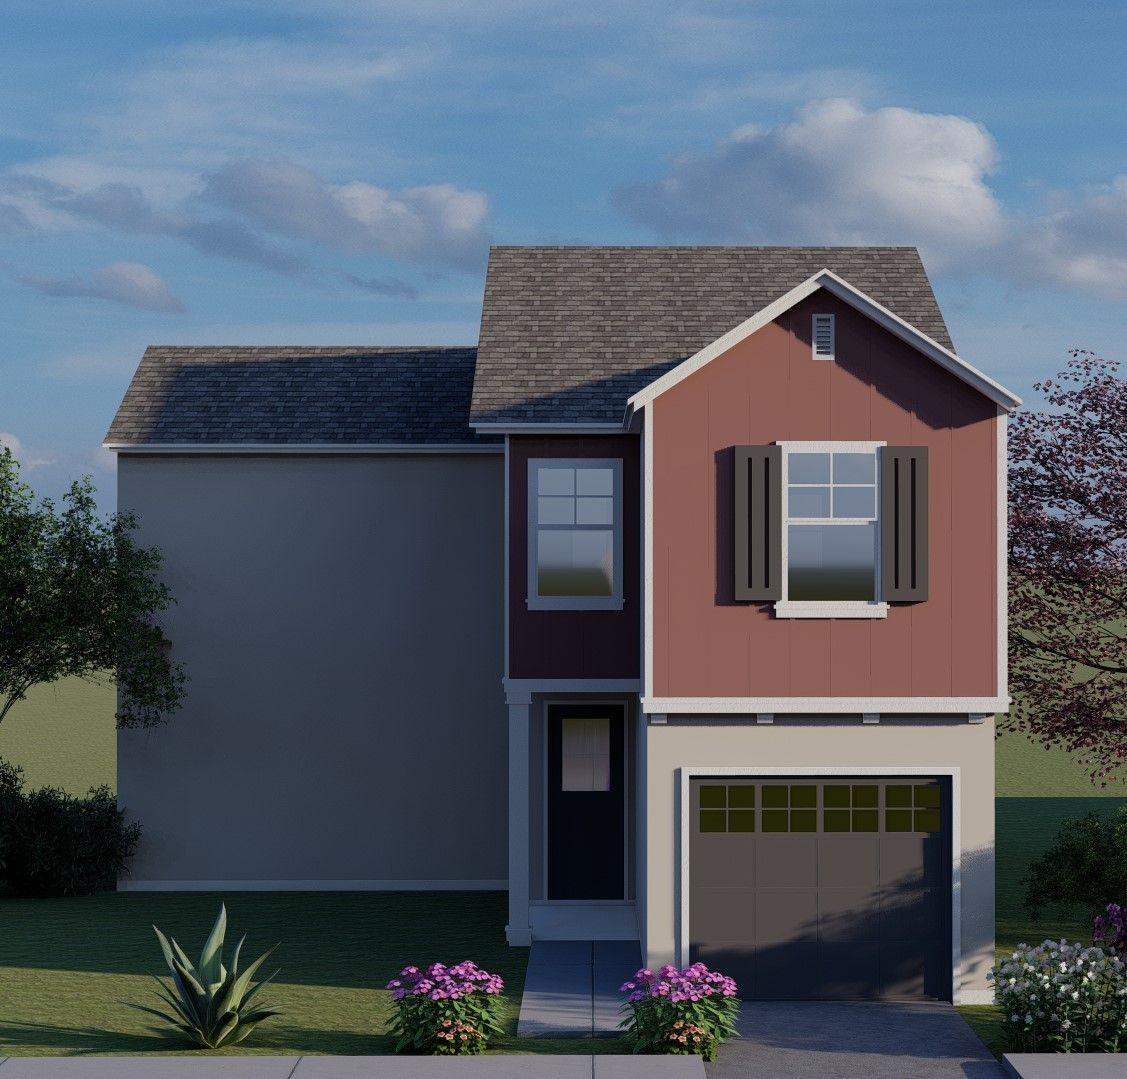 Farmhouse:Plan 3